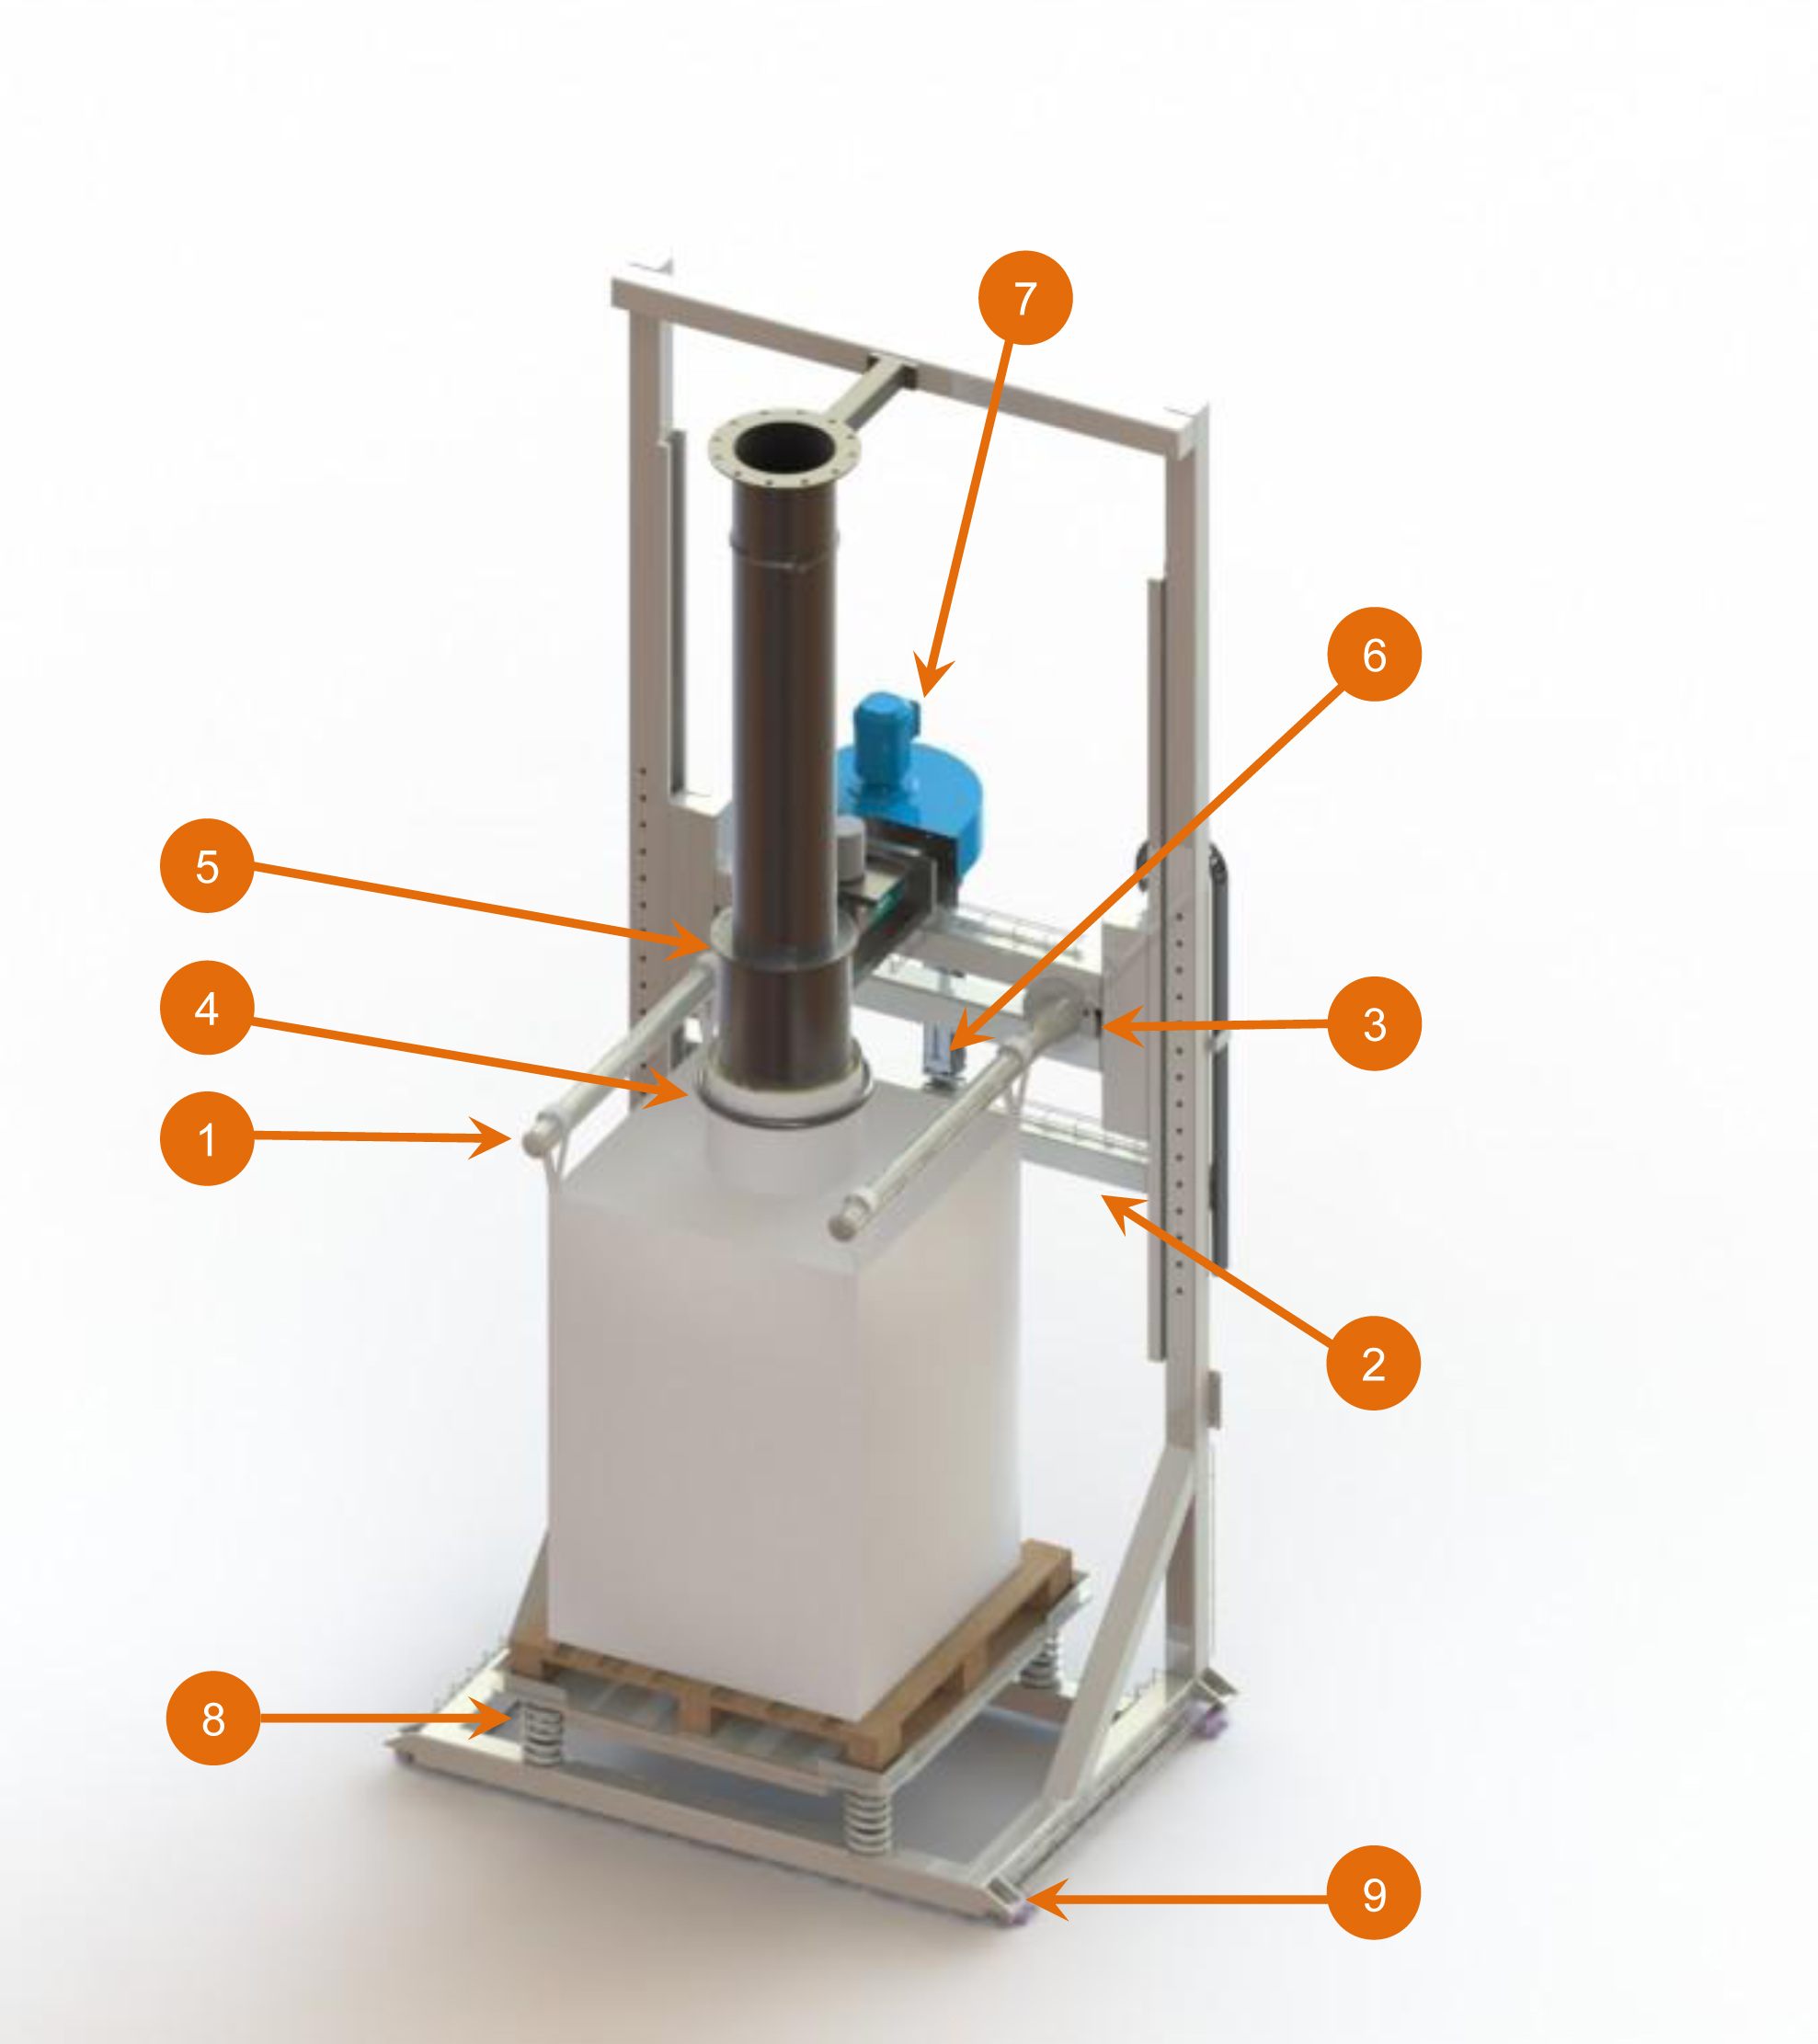 specification big bag filling system fibc station jumbo bag flowmatic 03 palamatic